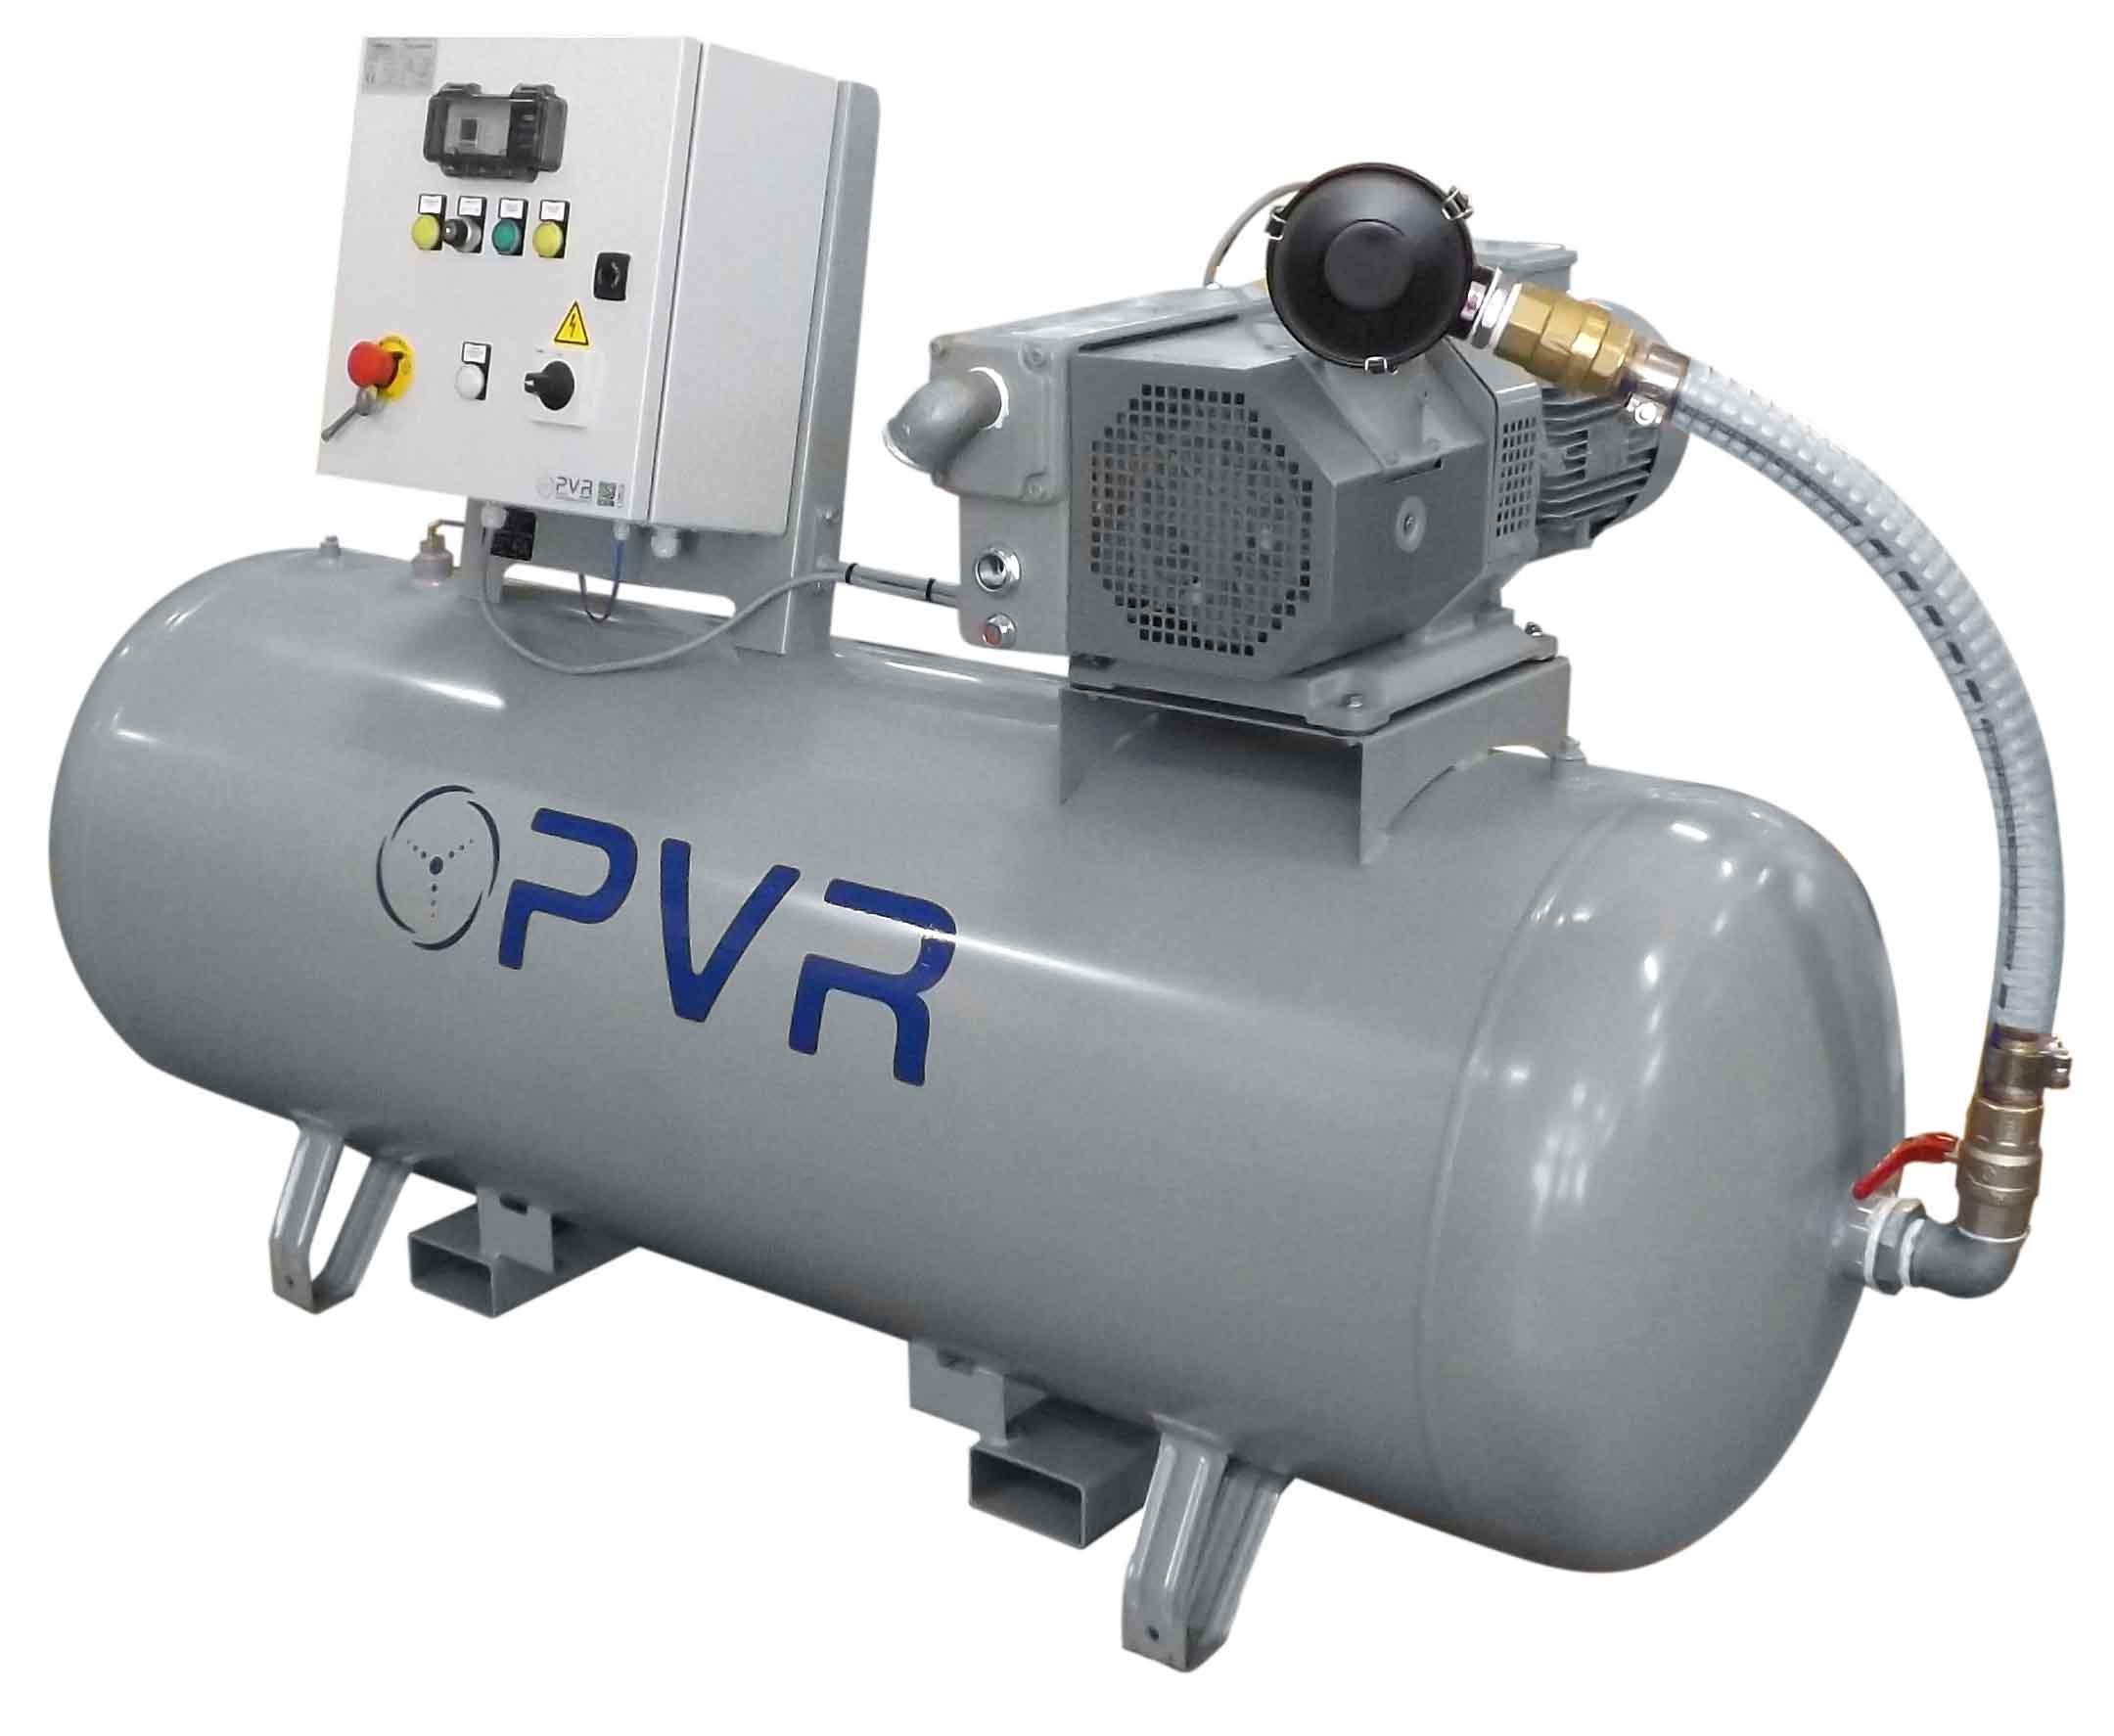 csk-cdk-ctk-kompact-central-vacuum-system